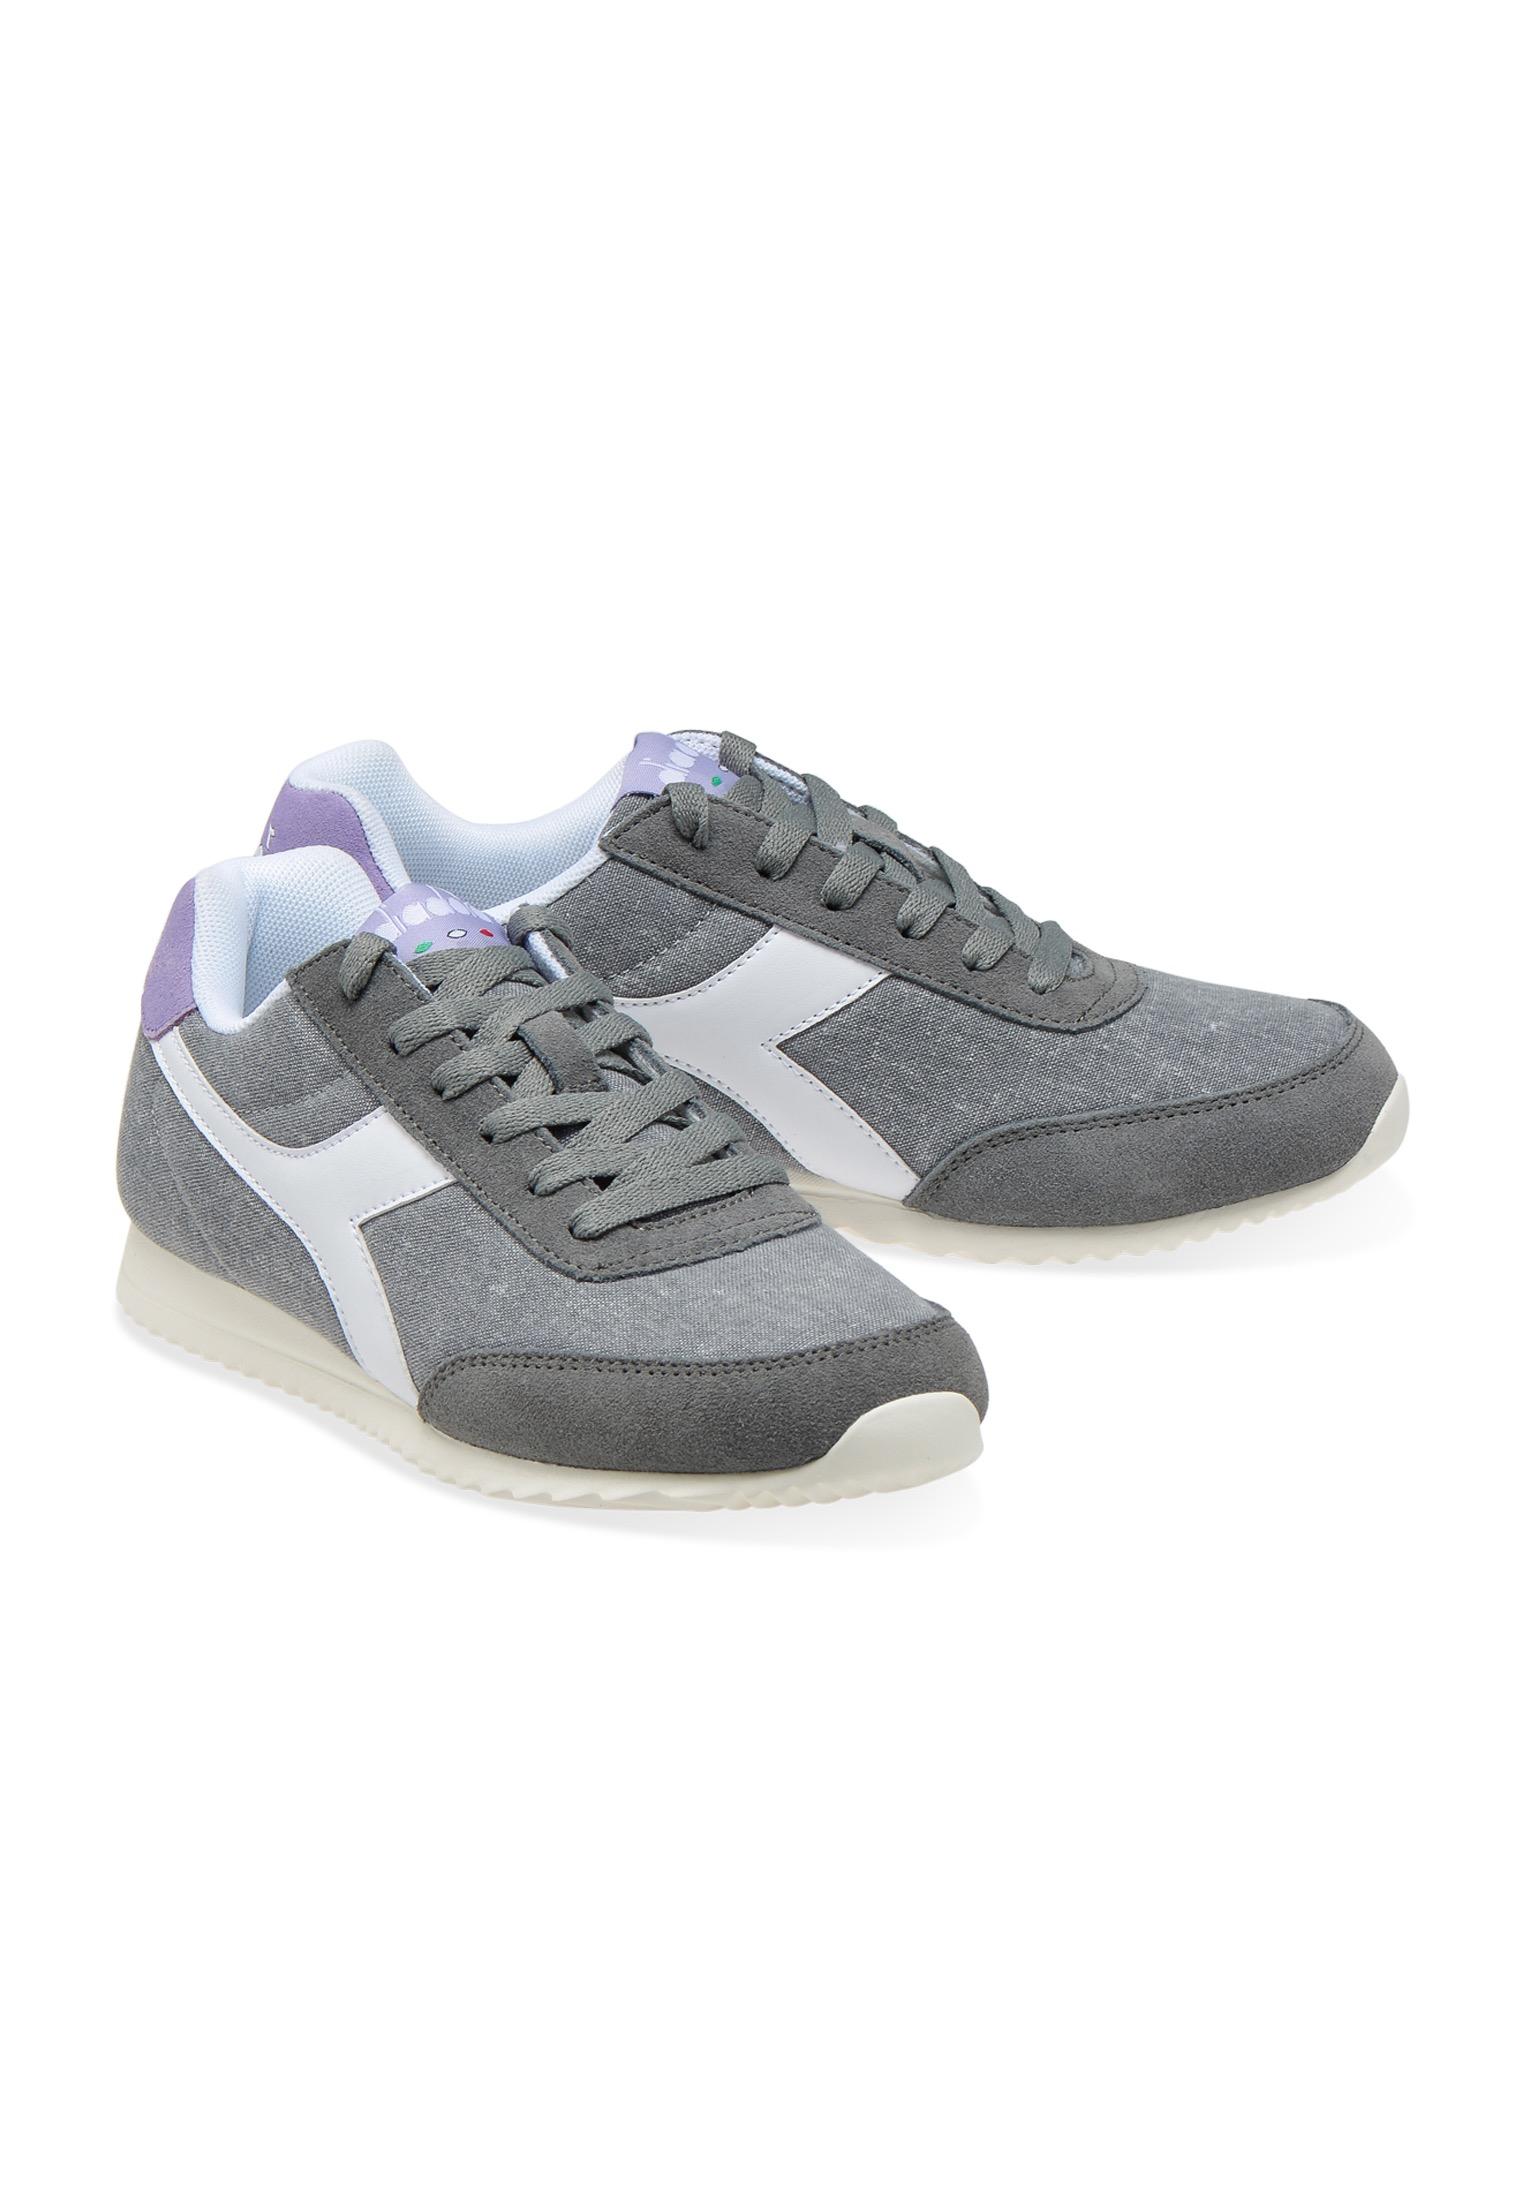 Scarpe-Diadora-Jog-Light-C-Sneakers-sportive-uomo-donna-vari-colori-e-taglie miniatura 83